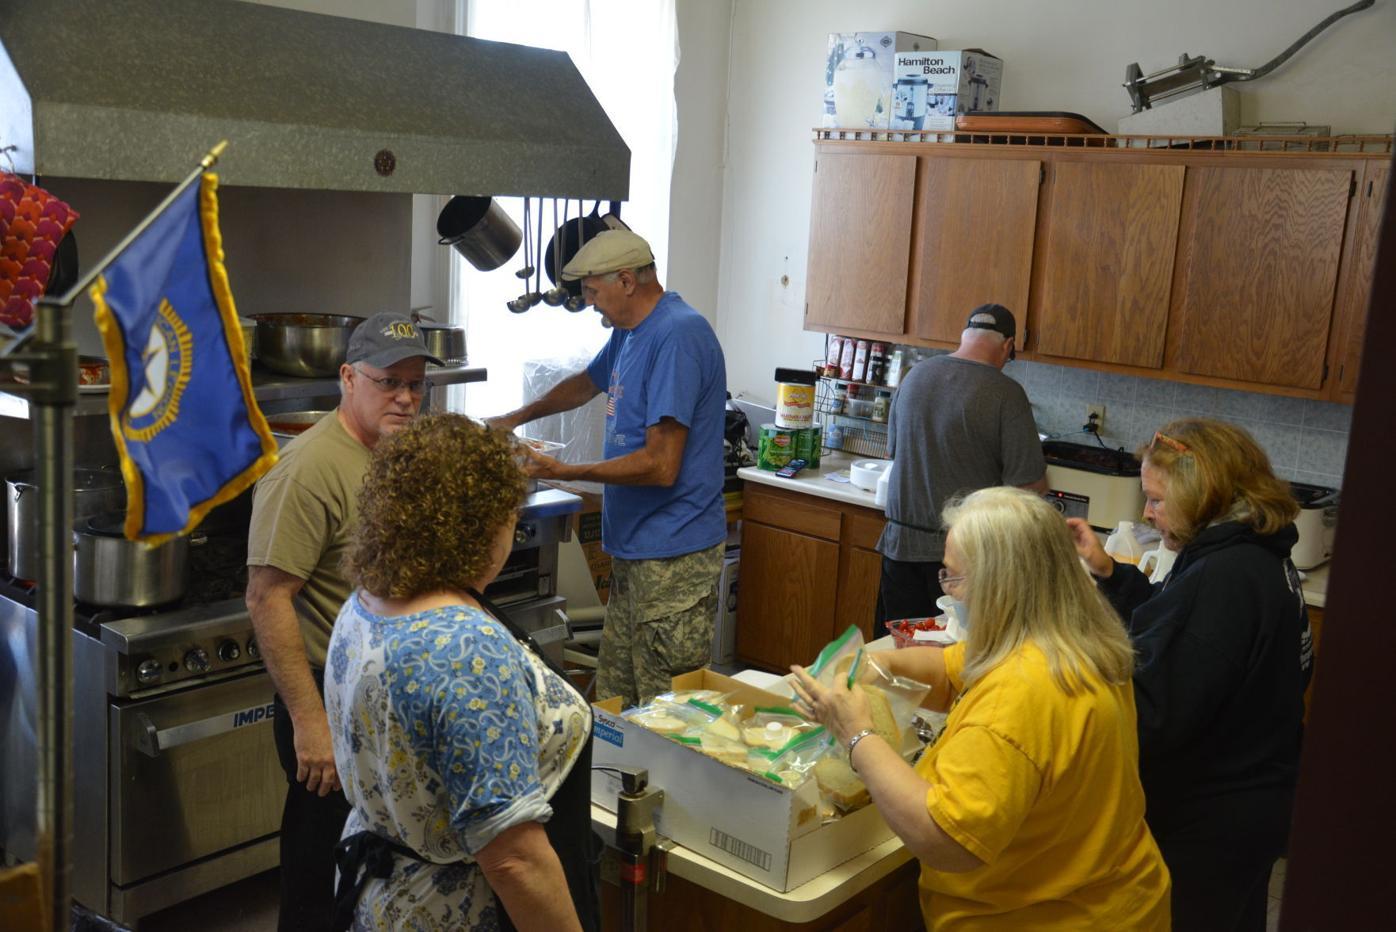 Preparing meals